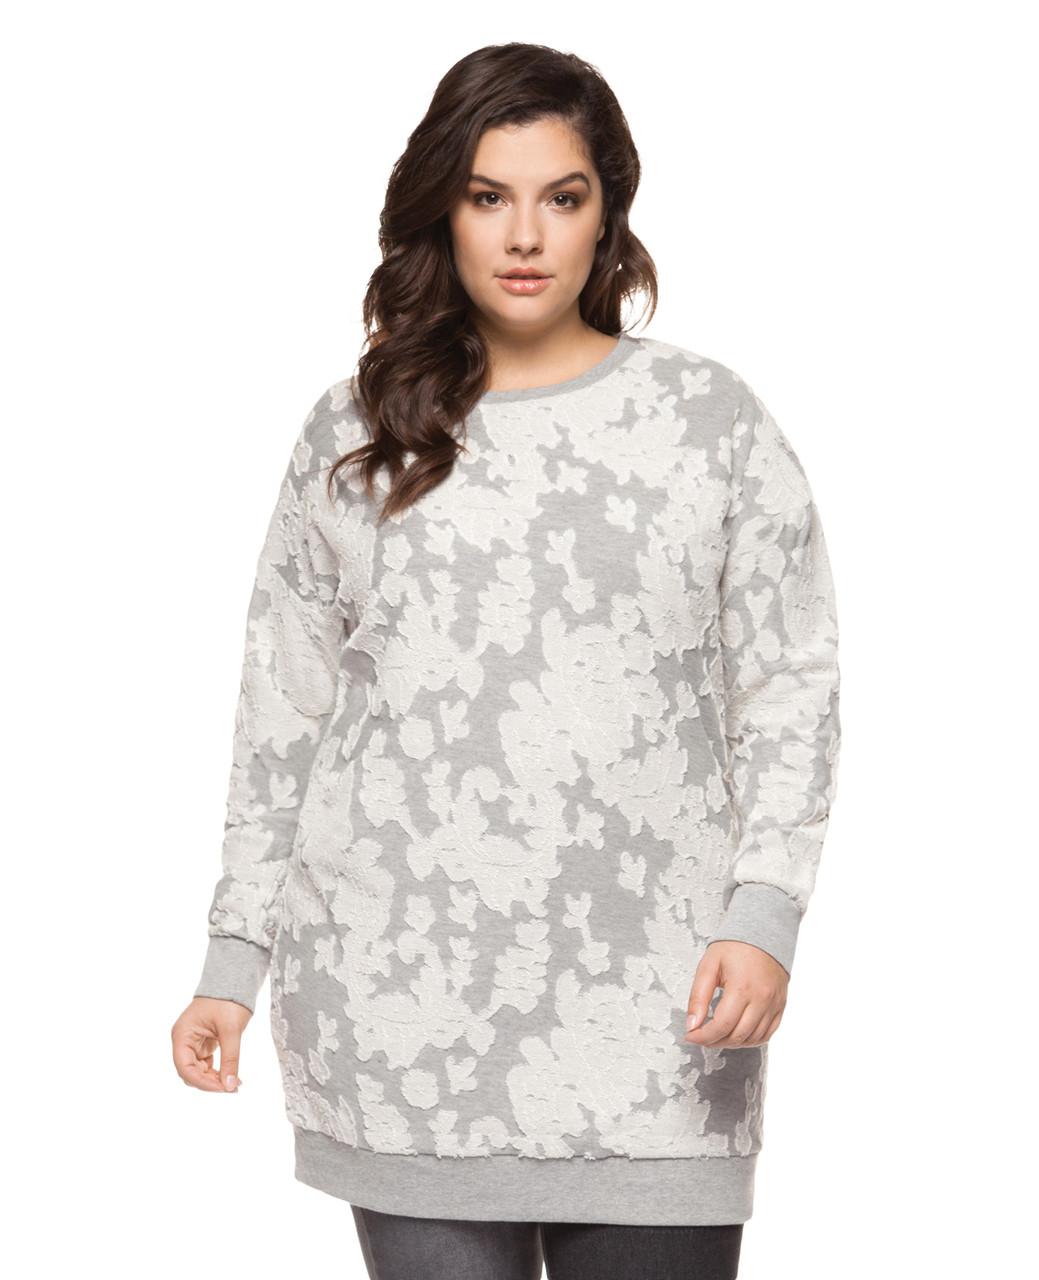 d98e632930 Women's Plus Size Jacquard Print Knit Top | Northern Reflections